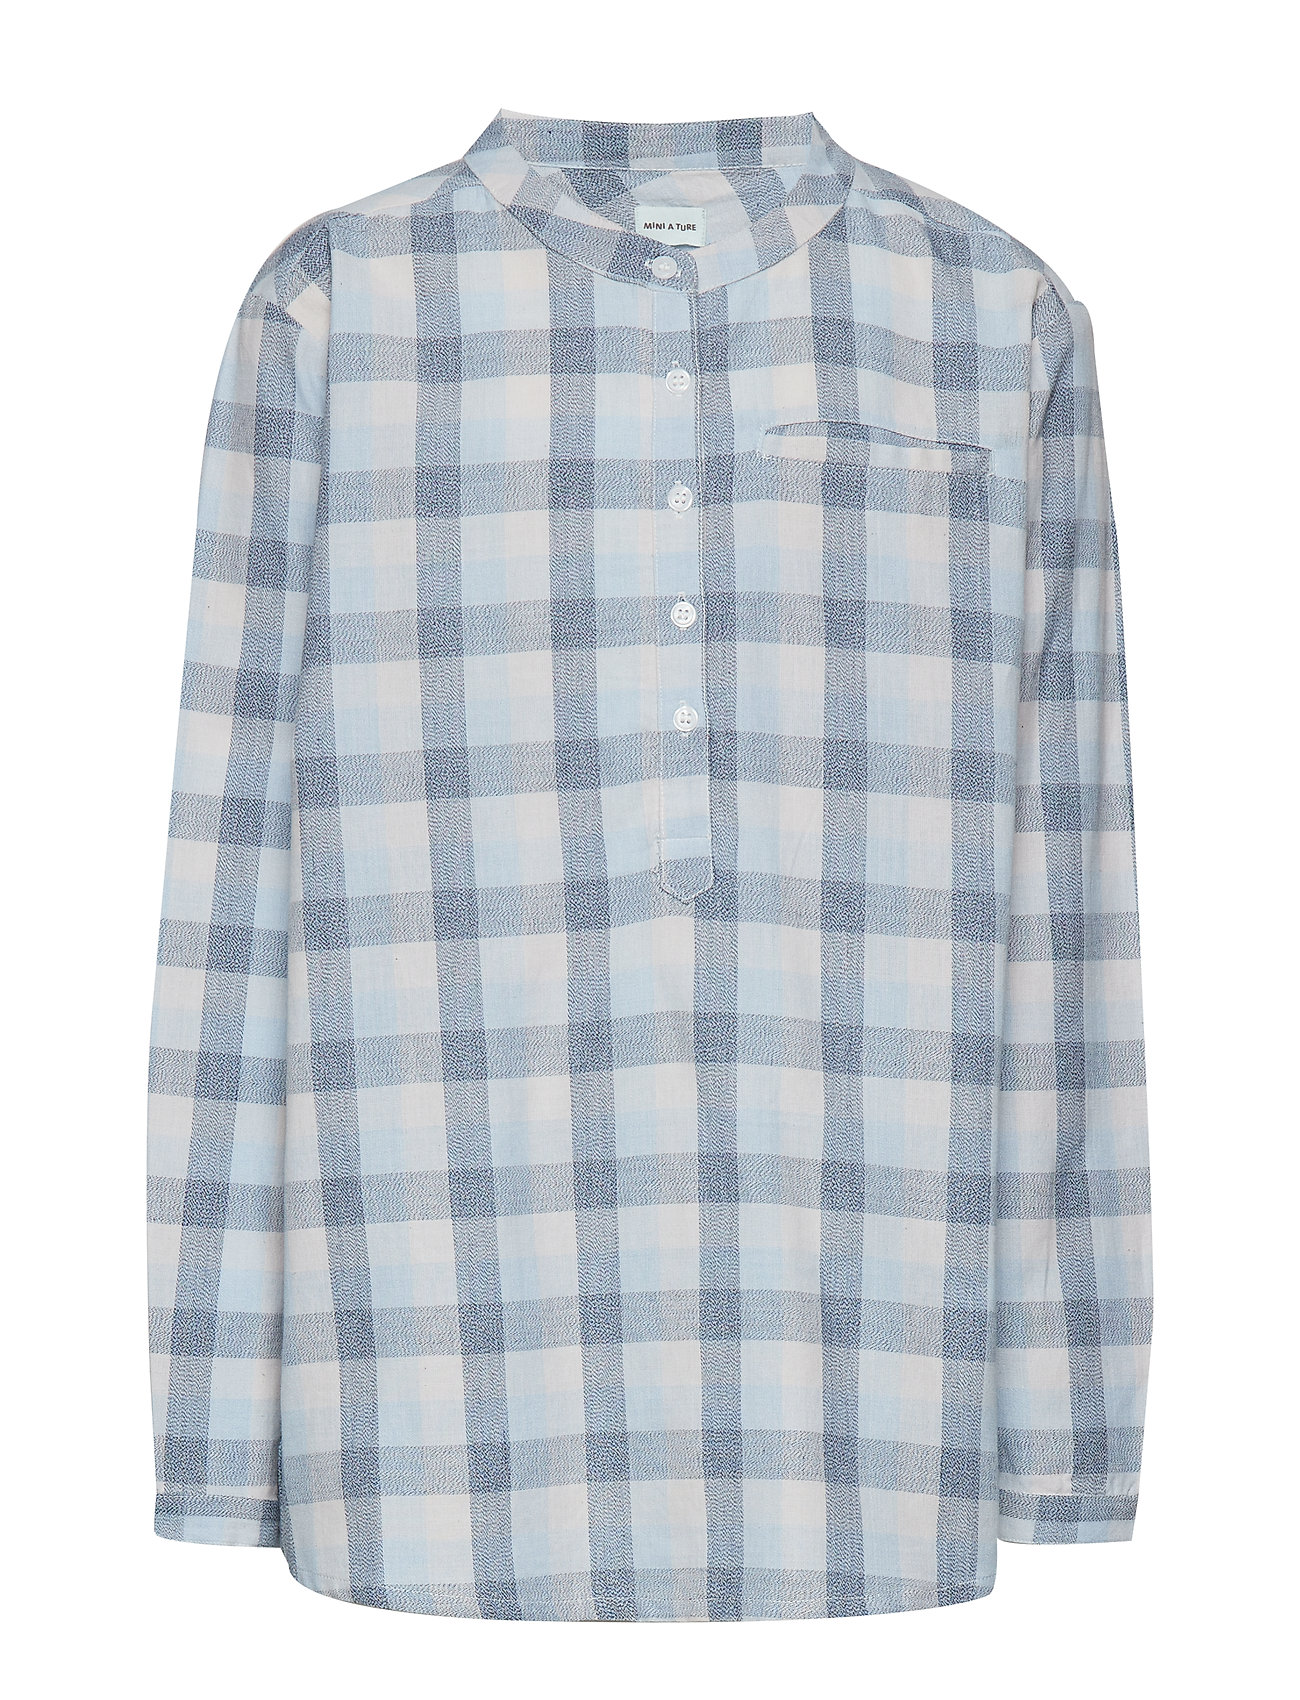 Mini A Ture Lai Shirt, MK - CORYDALIS BLUE